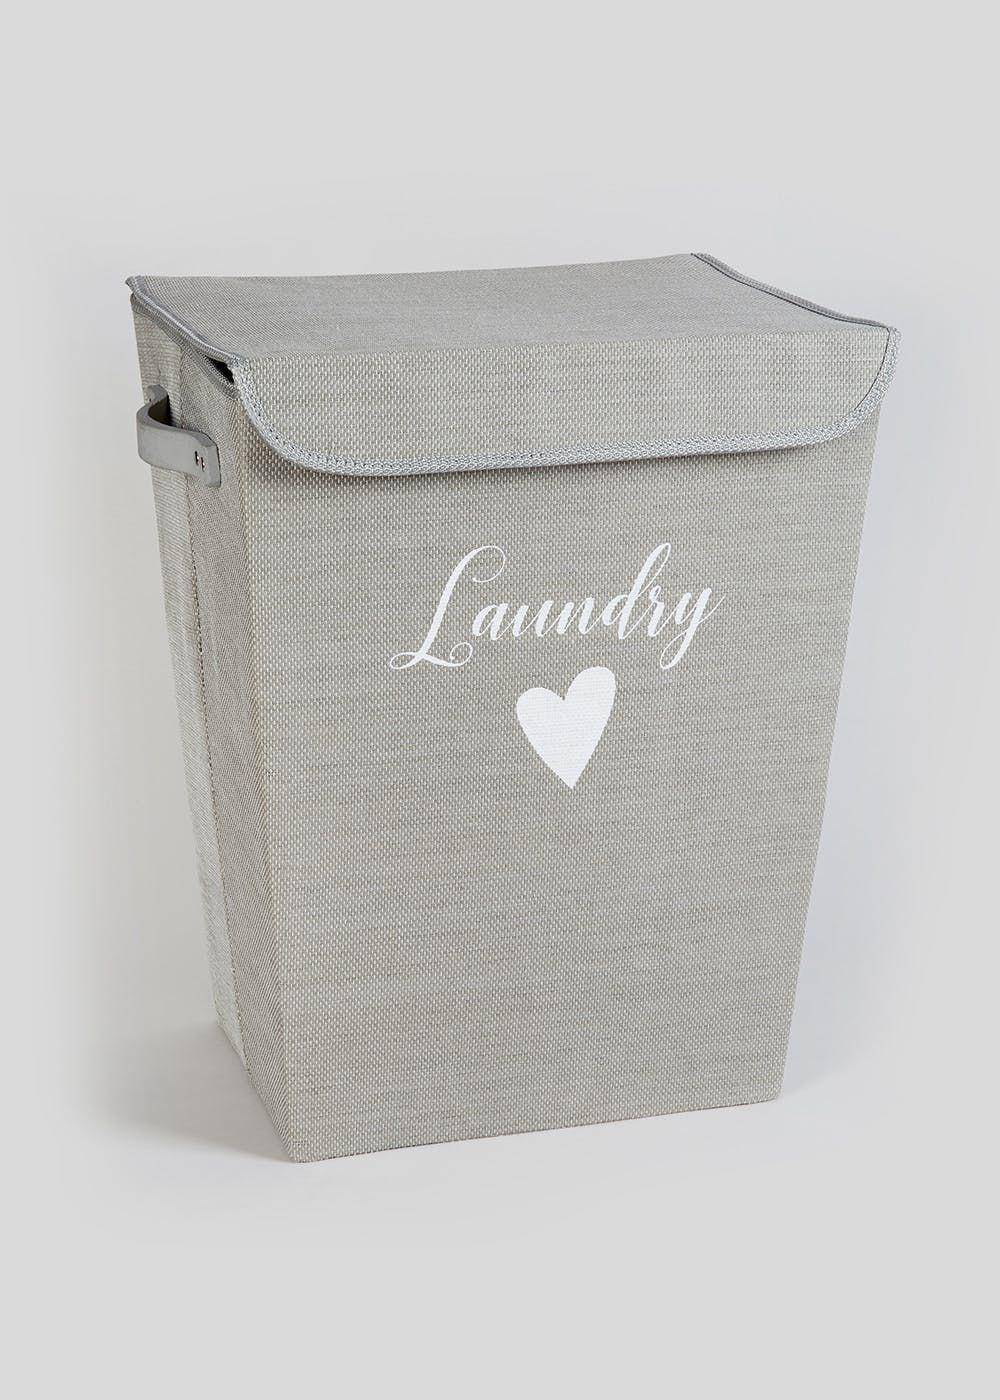 Fabric Laundry Bin £14.00